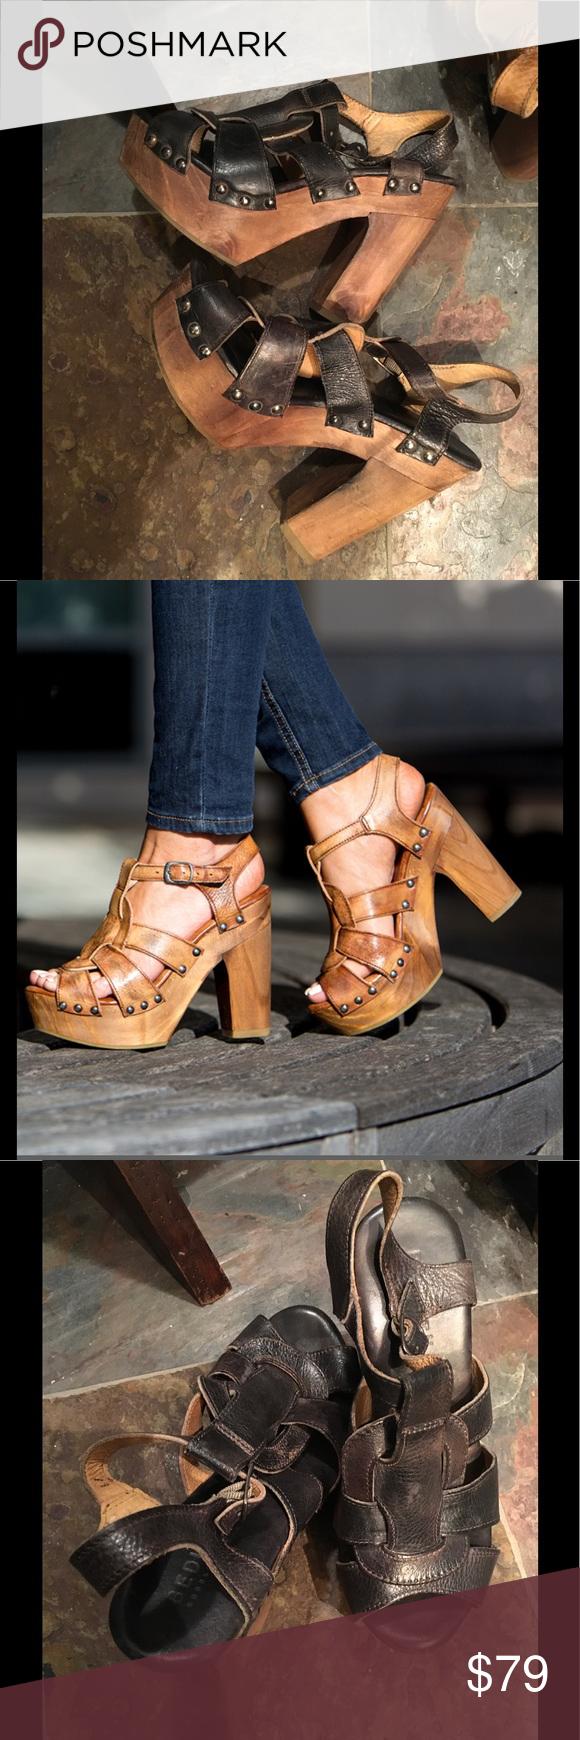 c59c4c1ce4f8 Bed Stu Melissa Platform Sandal Cobbler Series. Black Leather Lux Driftwood.  Size 8. Handcrafted in Mexico Bed Stu Shoes